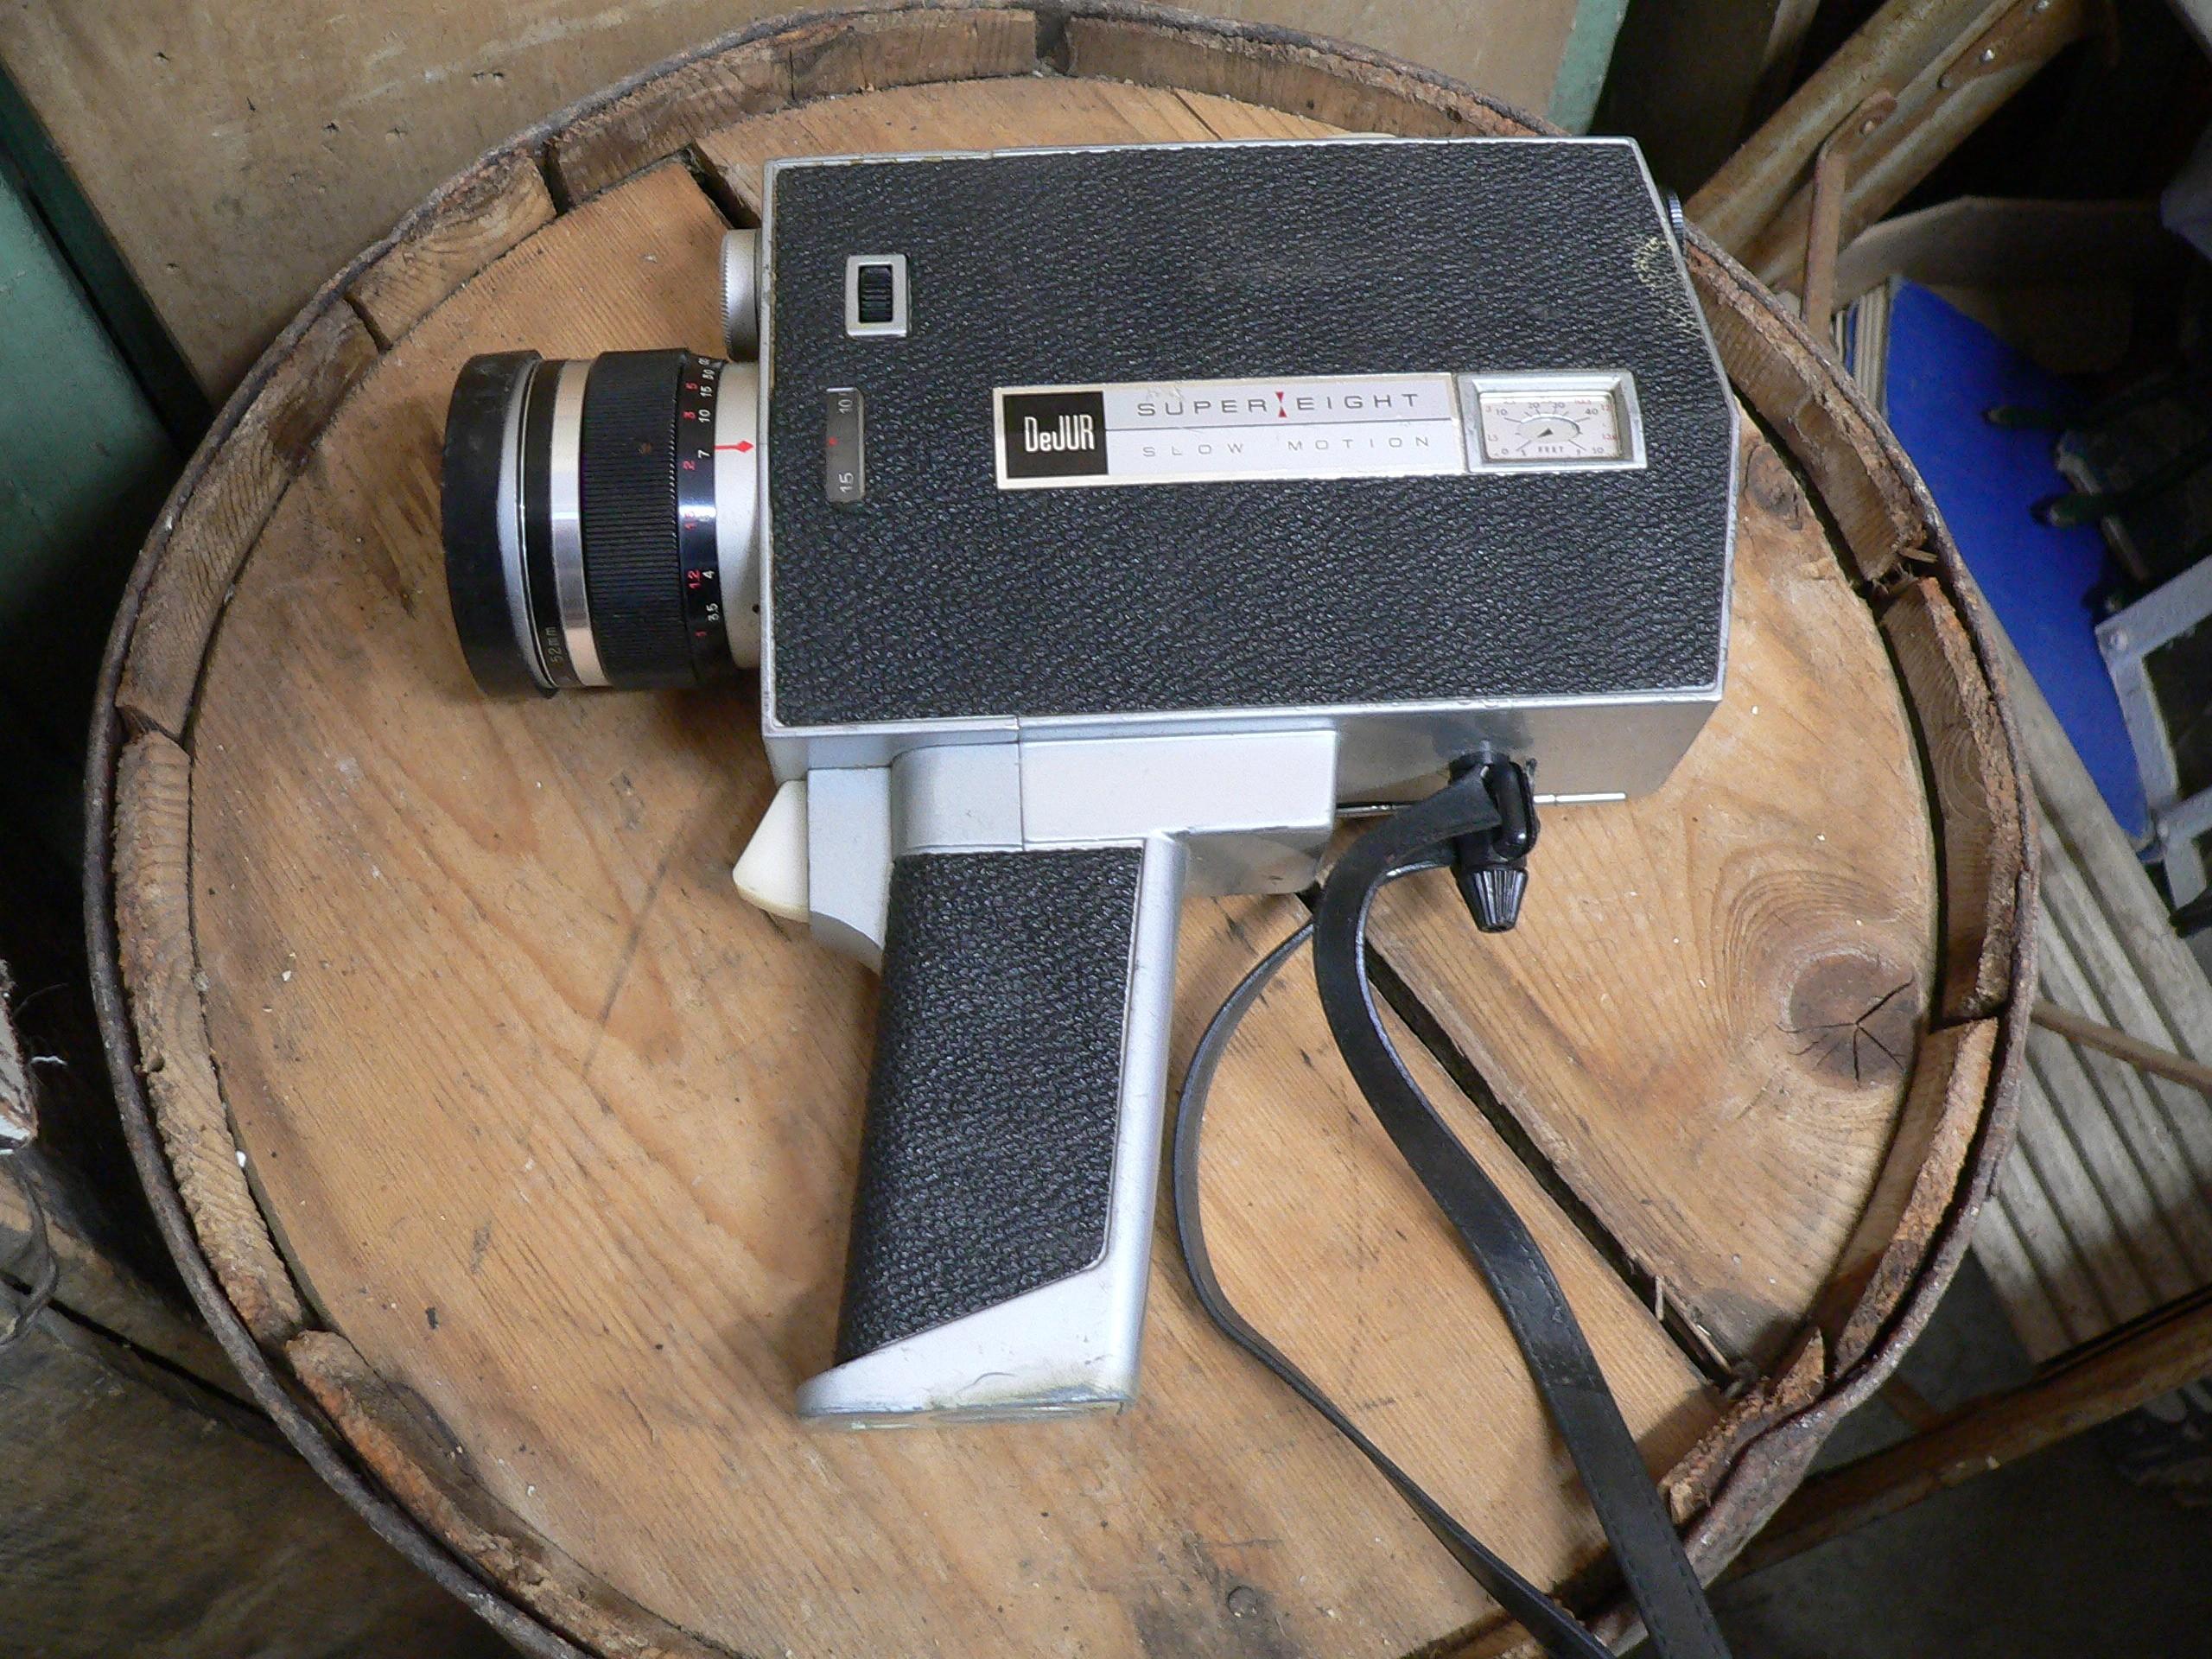 Petite camera antique de jur super eight slow motions # 6830.8